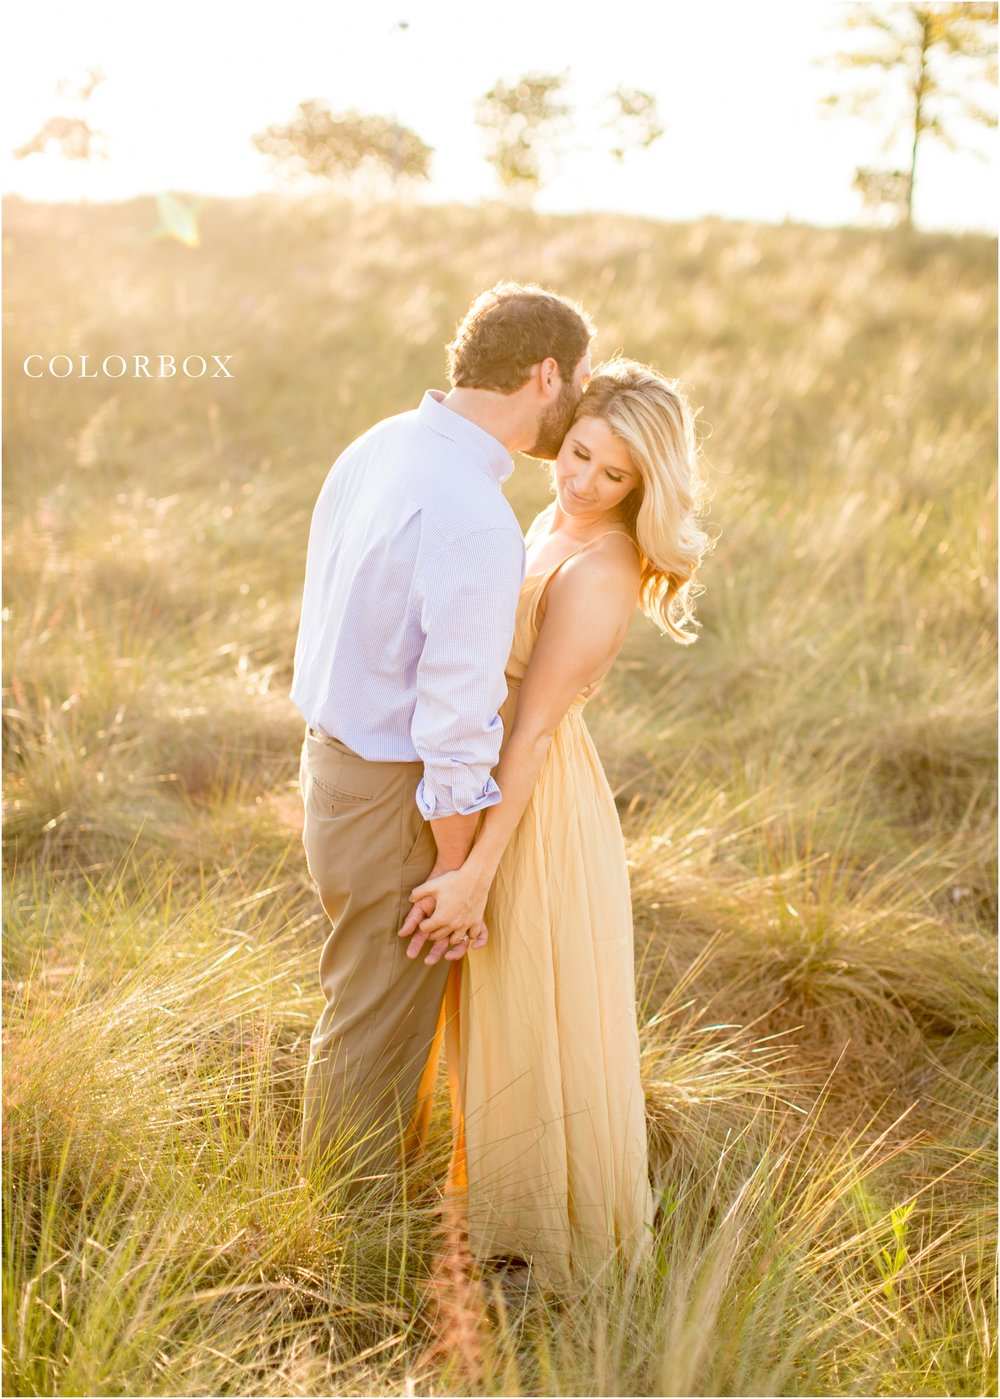 colorboxphotographers_5830.jpg